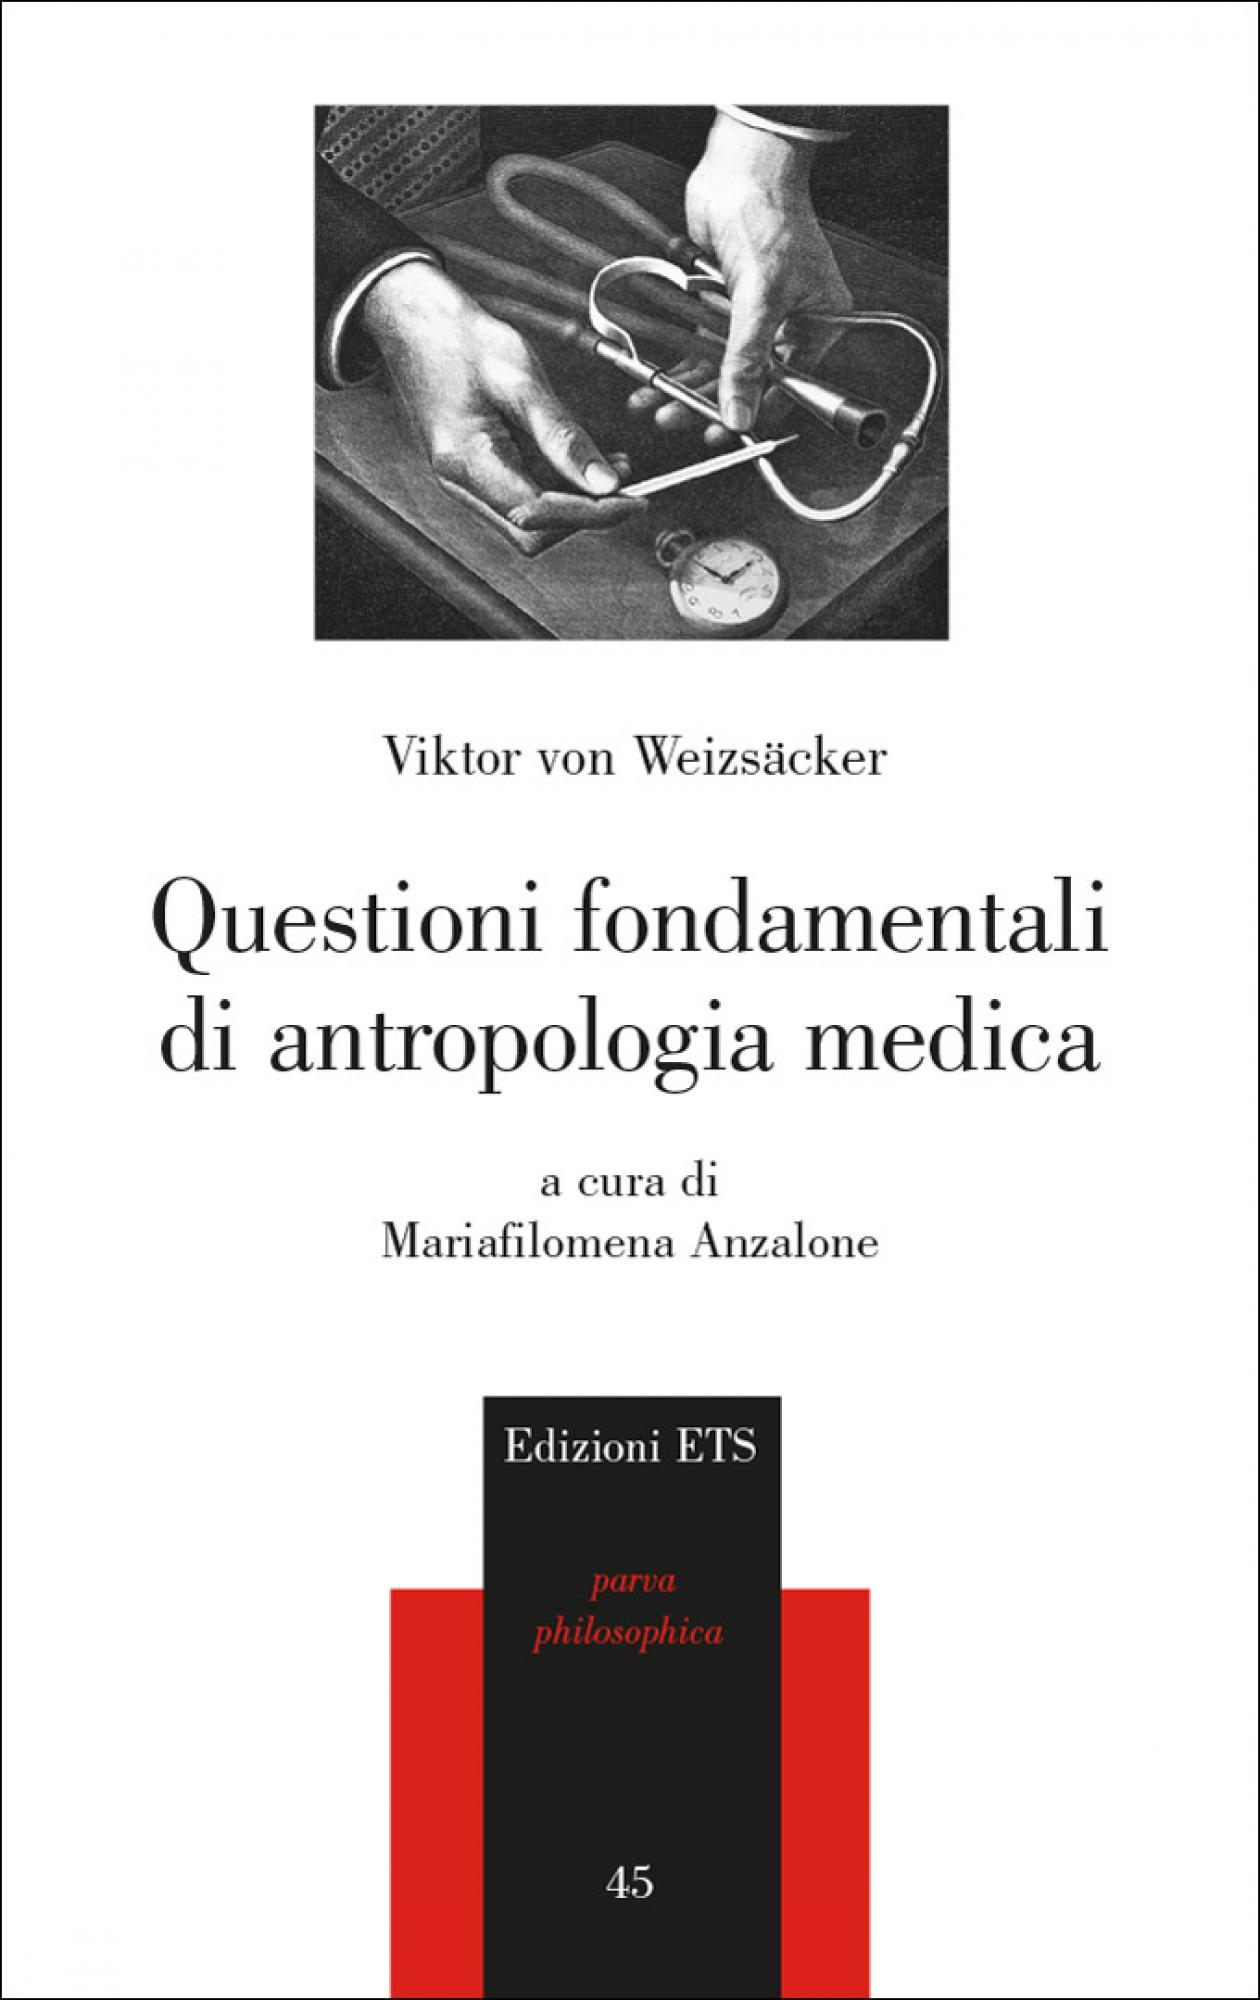 Questioni fondamentali di antropologia medica